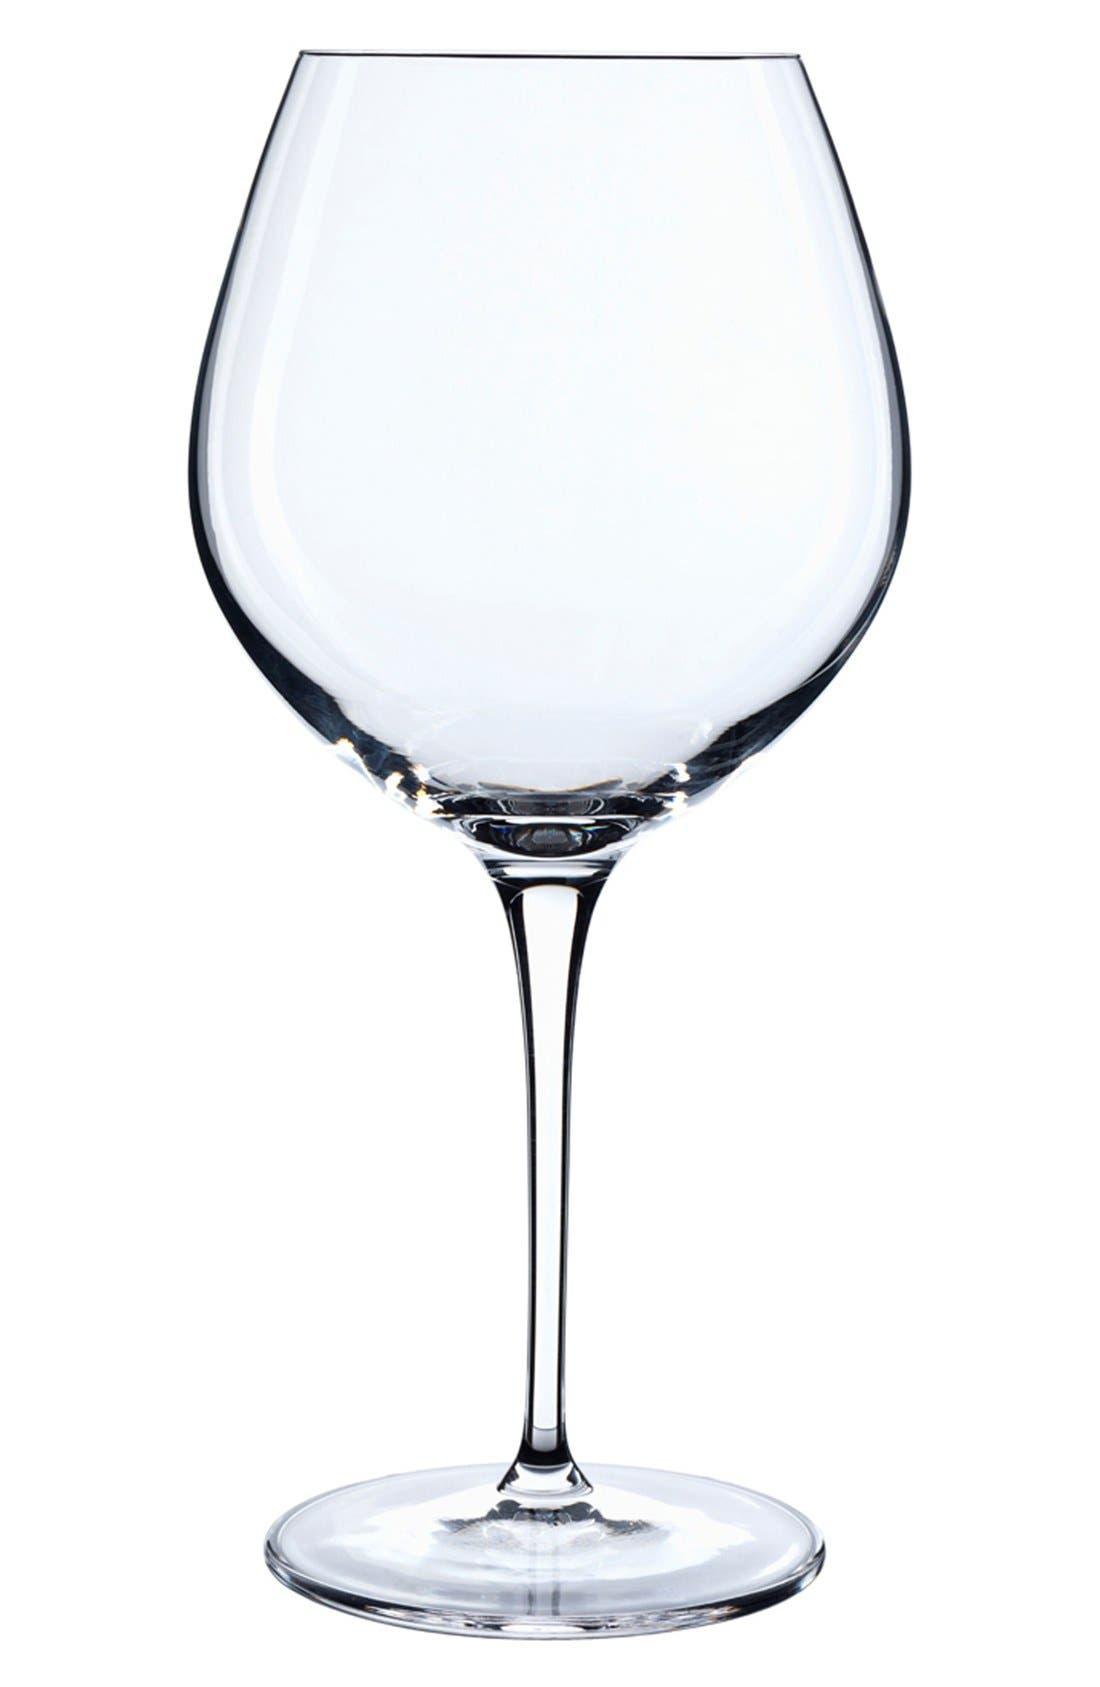 LUIGI BORMIOLI 'Crescendo' Bourgogne Glasses